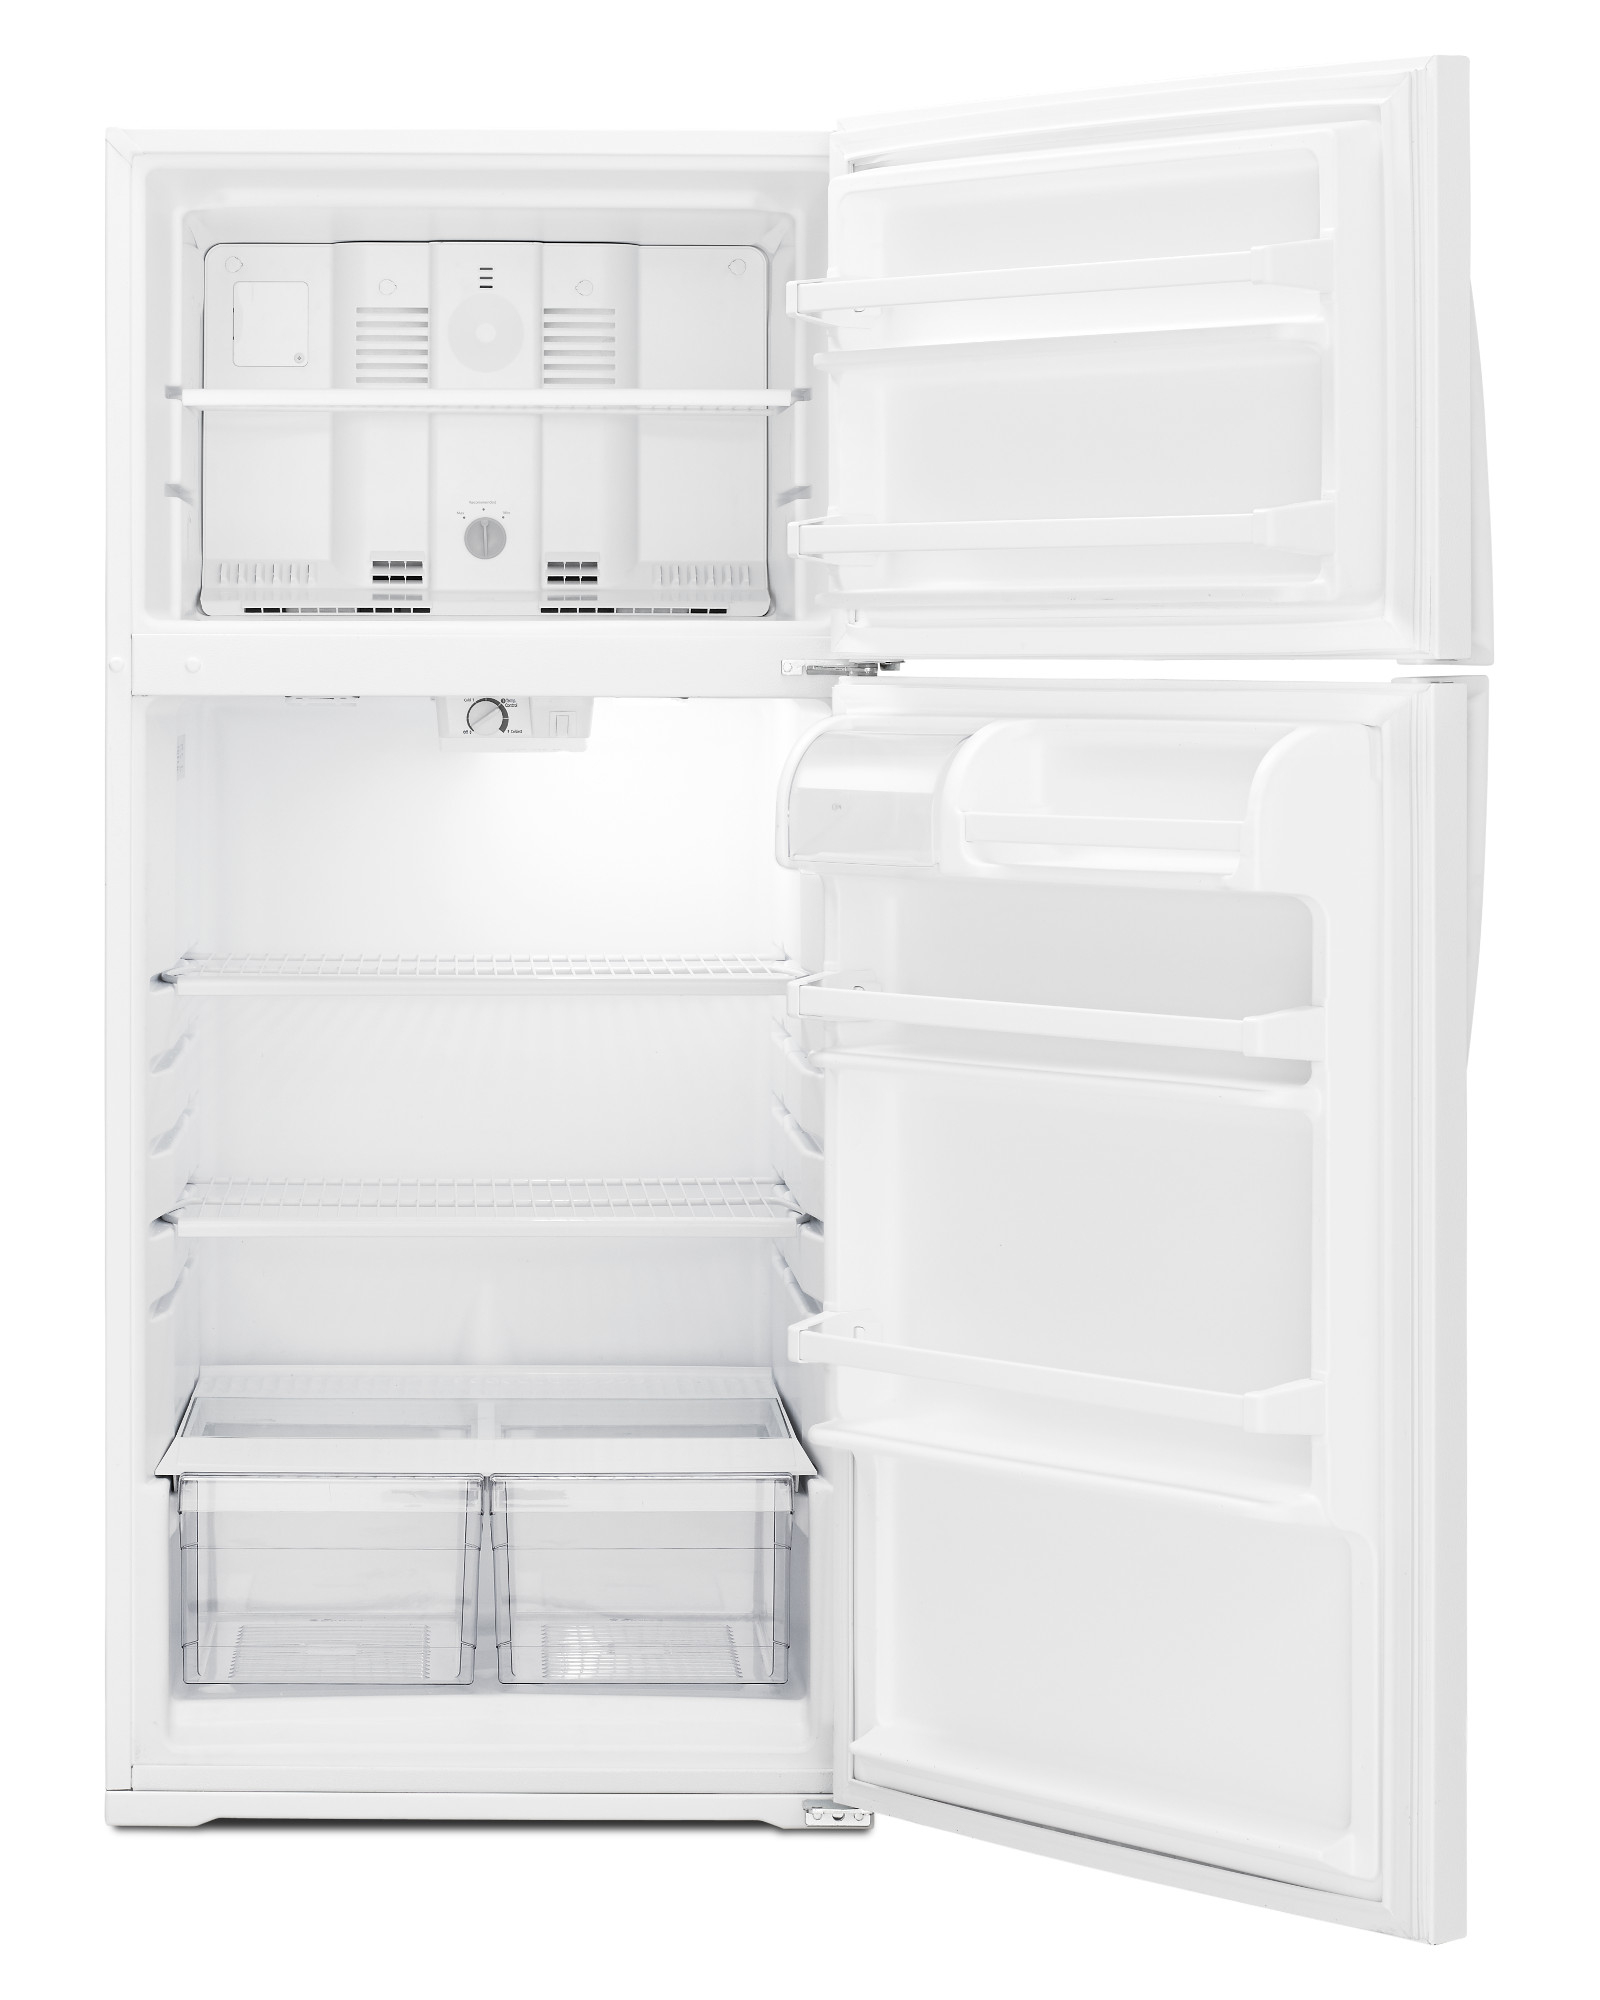 Whirlpool WRT134TFDW 14 cu. ft. Top Freezer Refrigerator - White